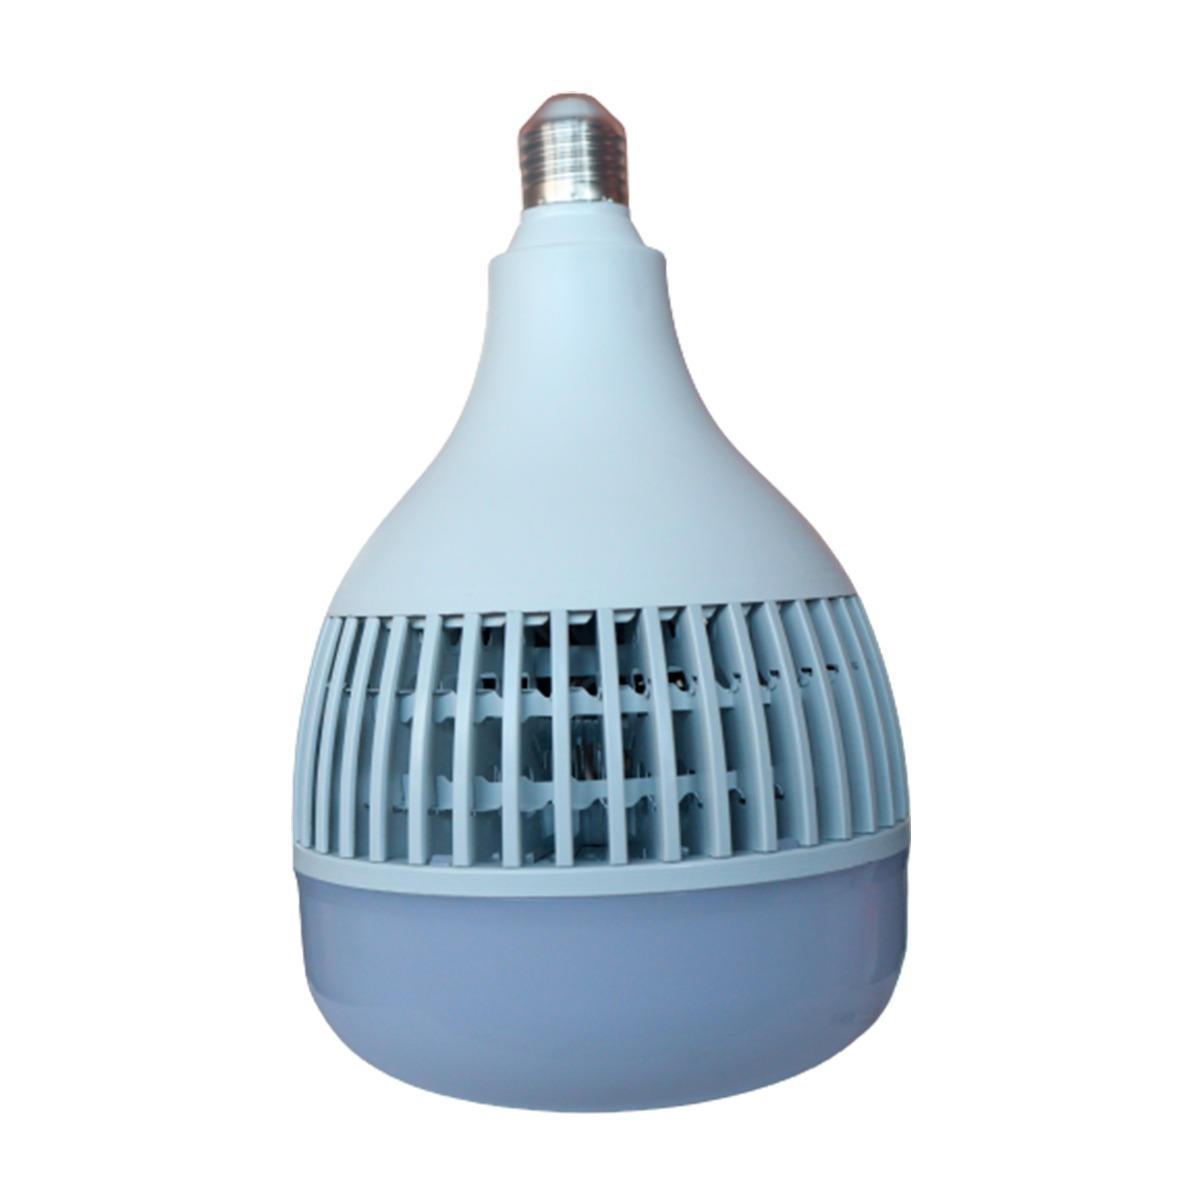 Lâmpada Bulbo Led 90W Branco Frio E27 Bivolt